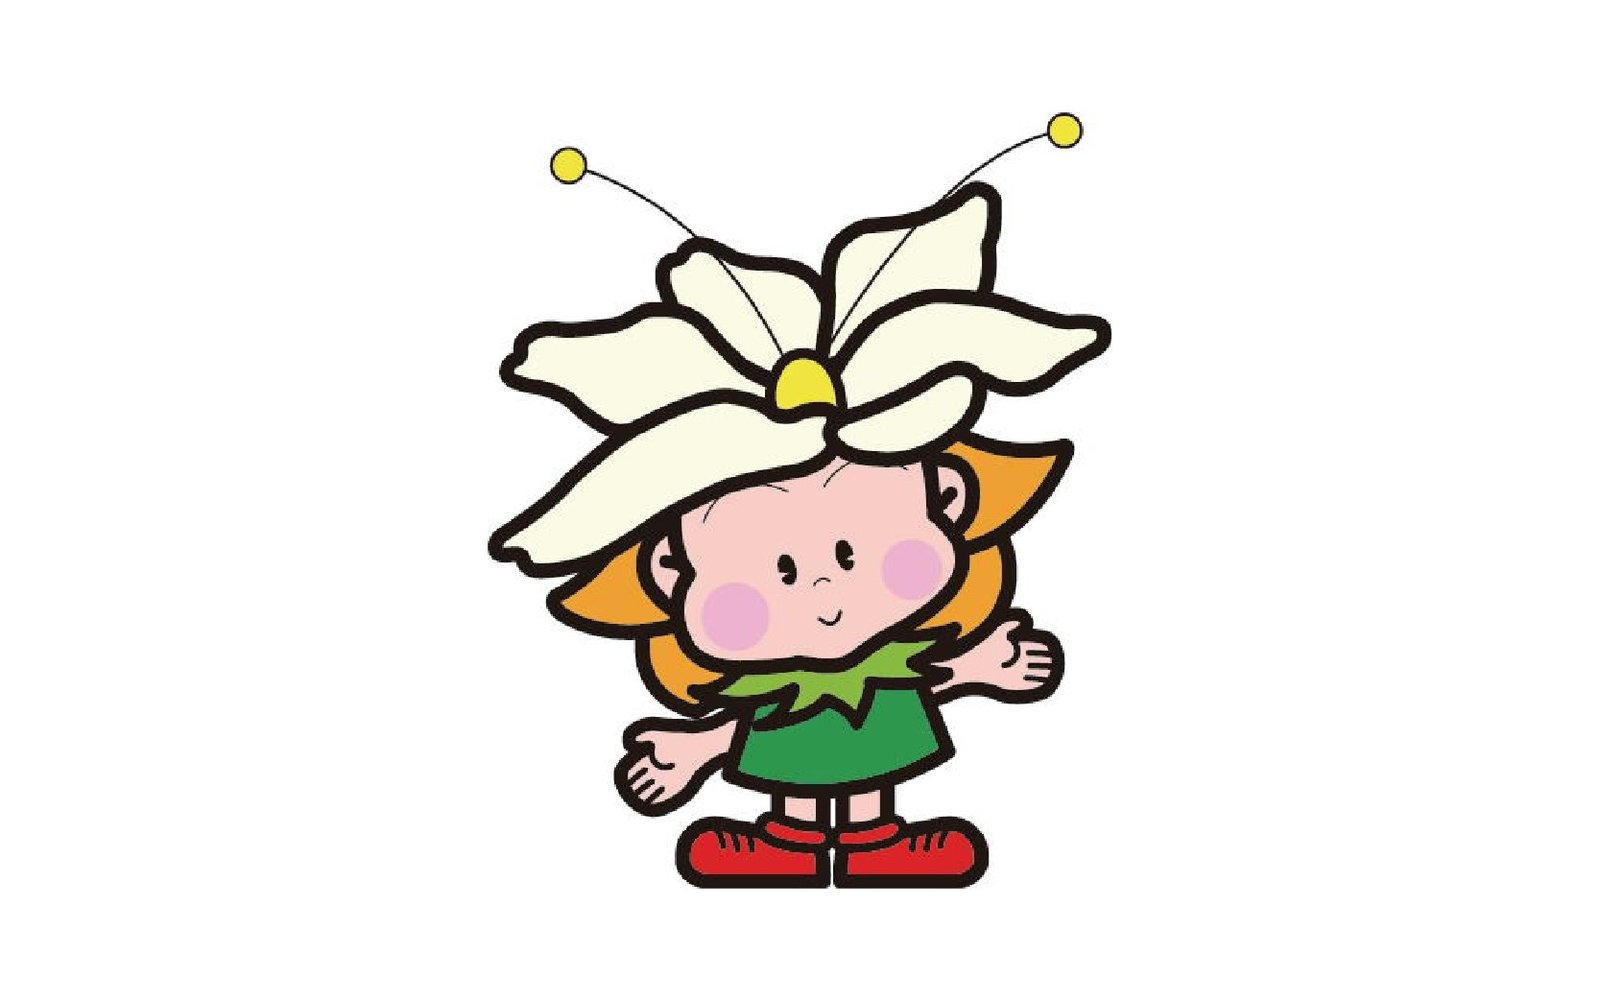 rabu chan is the flower mascot for rankoshi town in hokkaido japan